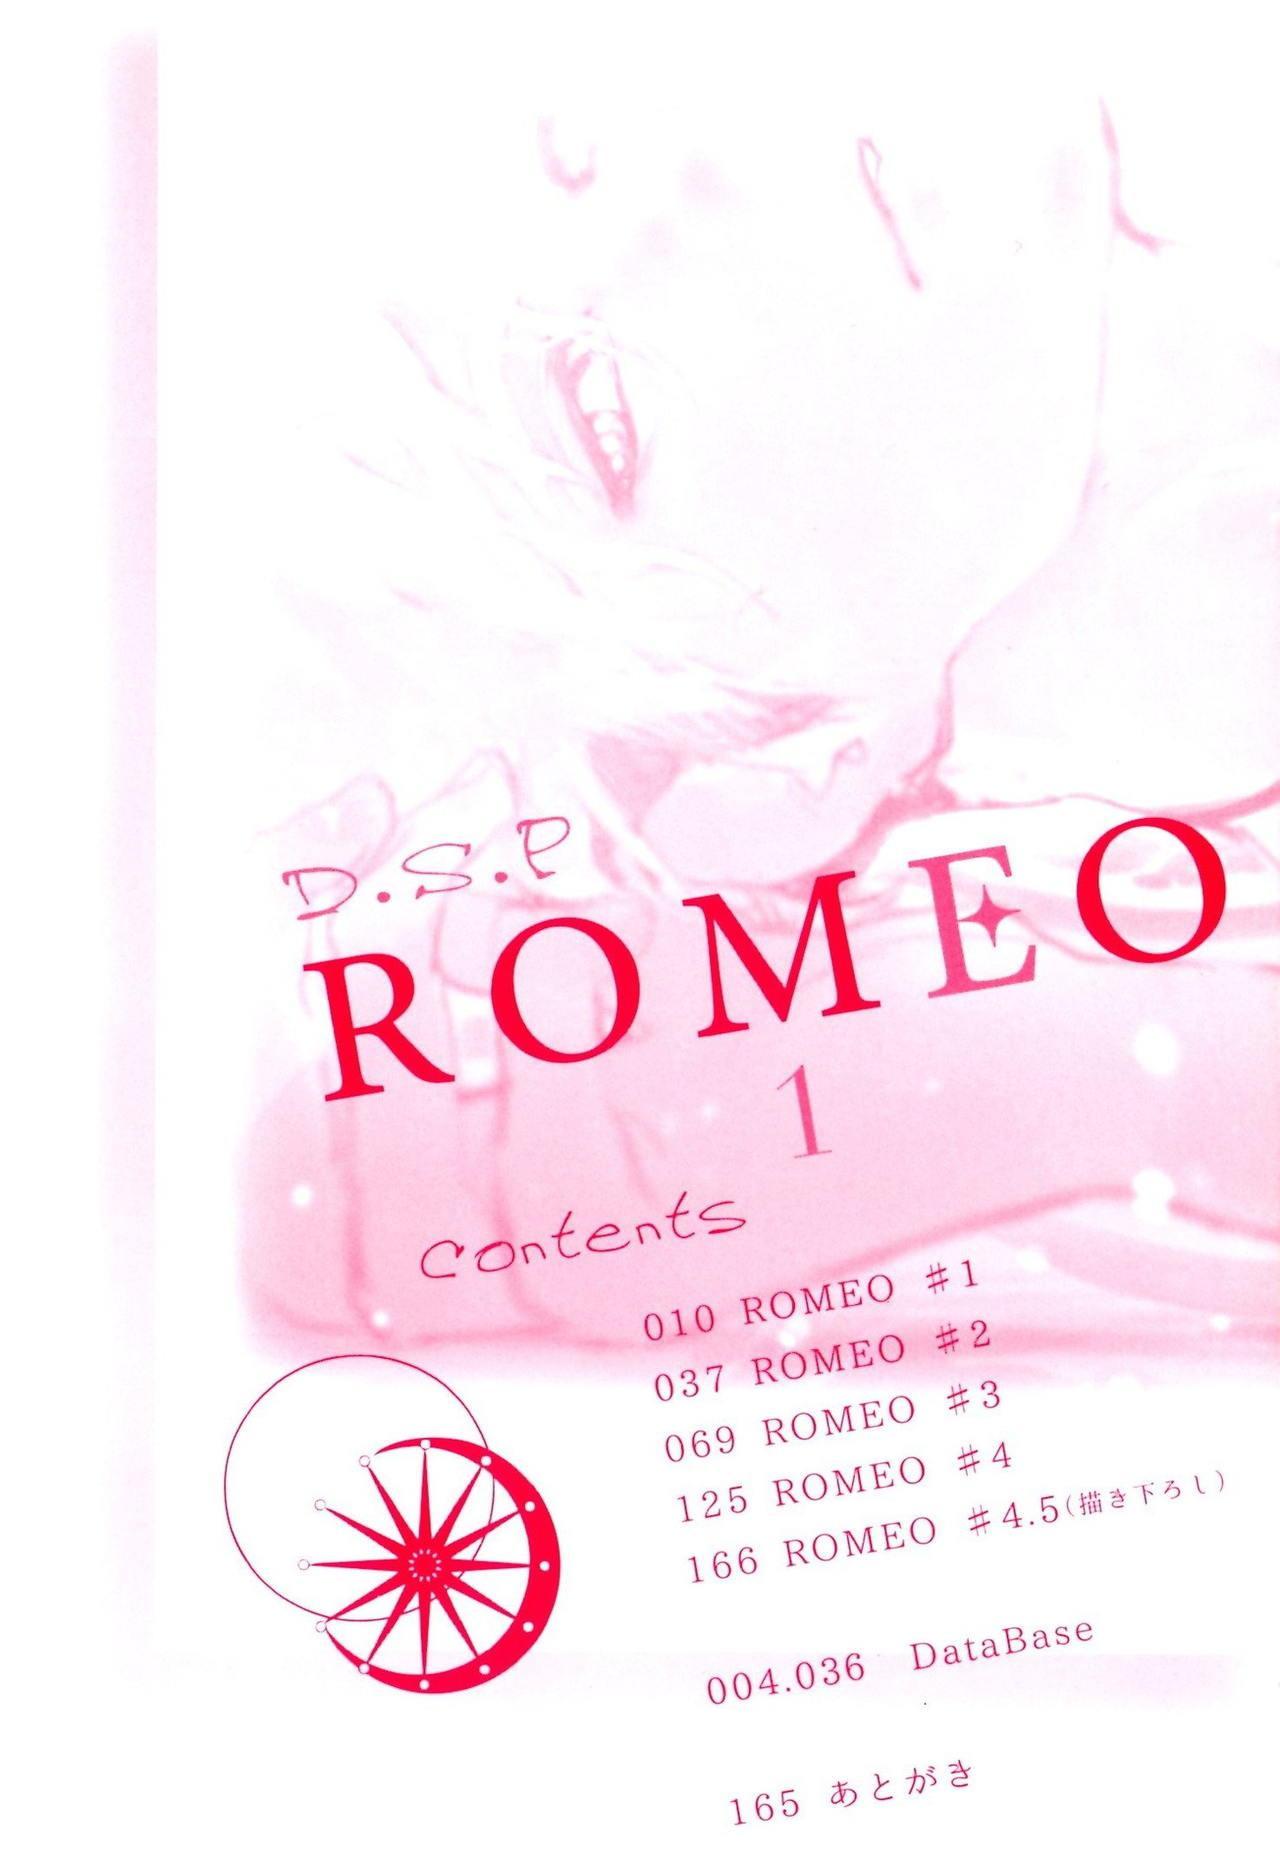 D.S.P Romeo 7